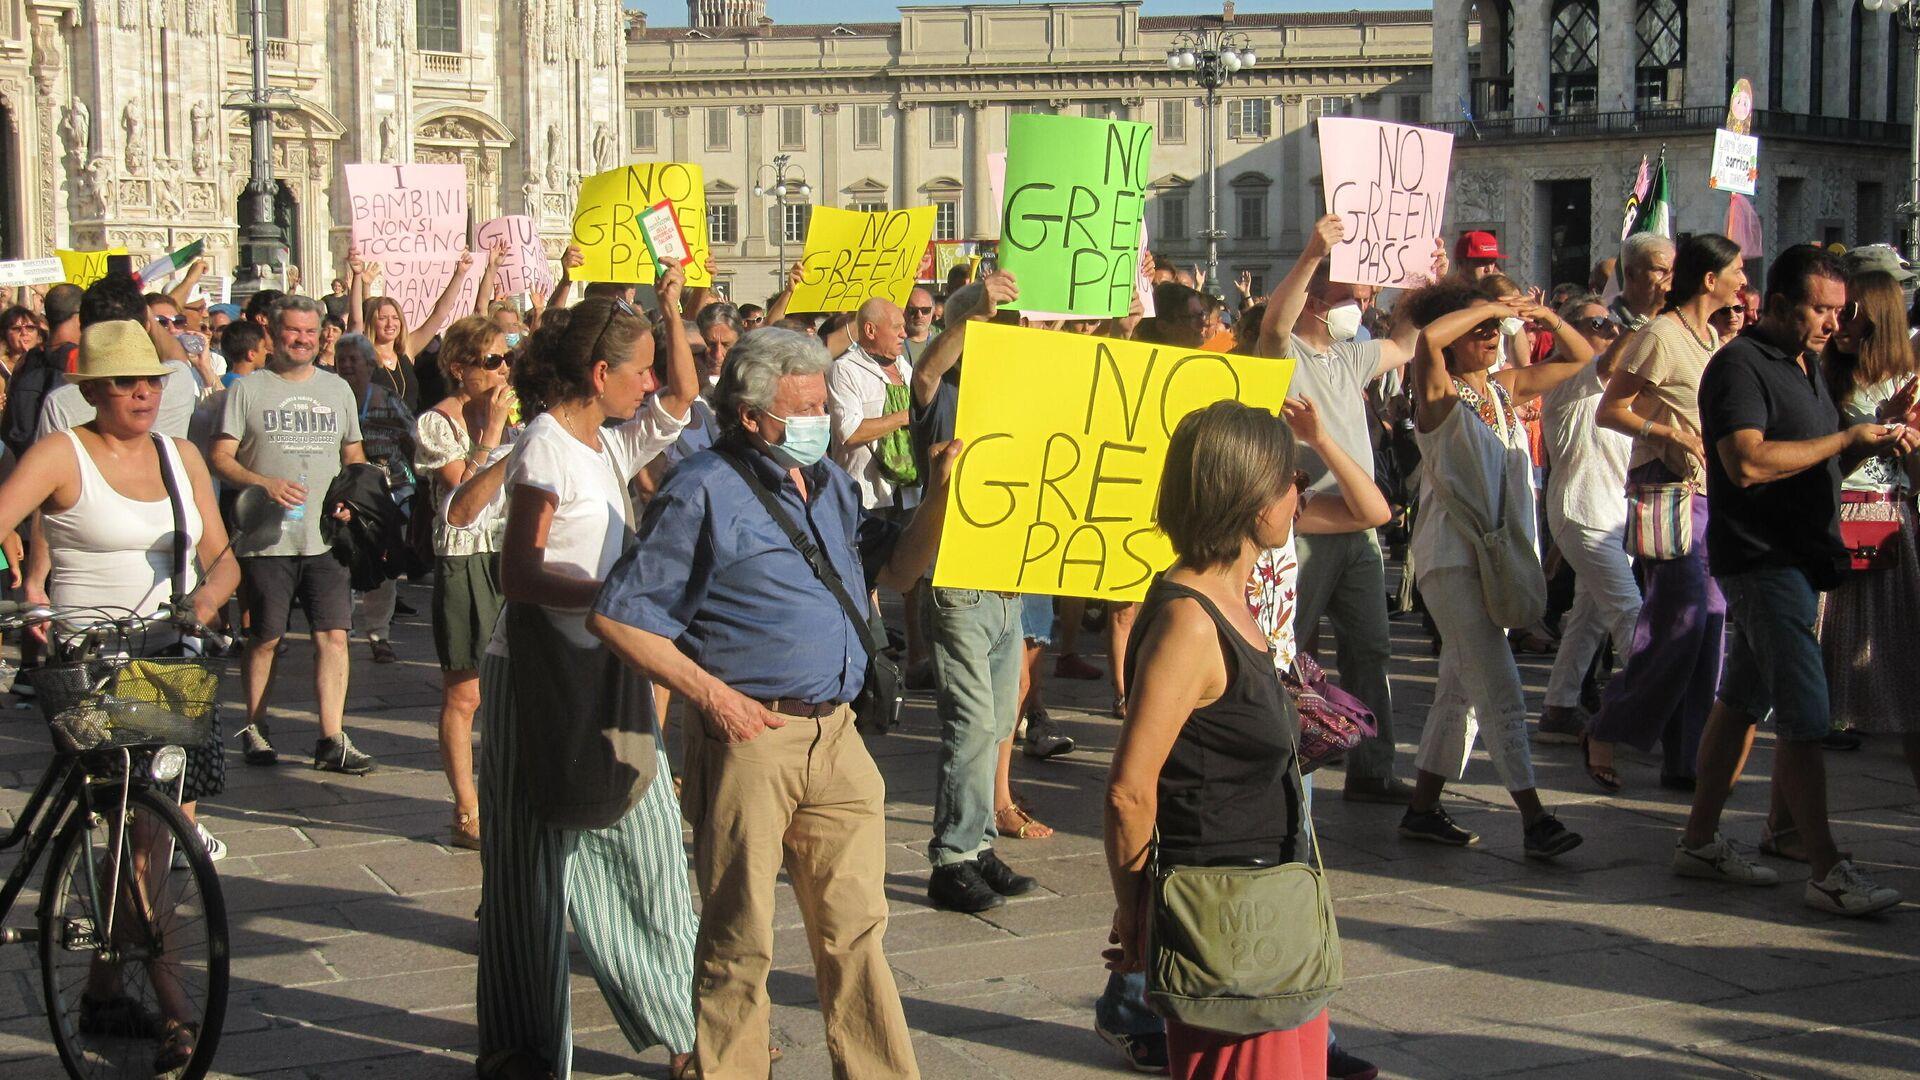 Manifestazione no Green pass a Milano  - Sputnik Italia, 1920, 15.08.2021